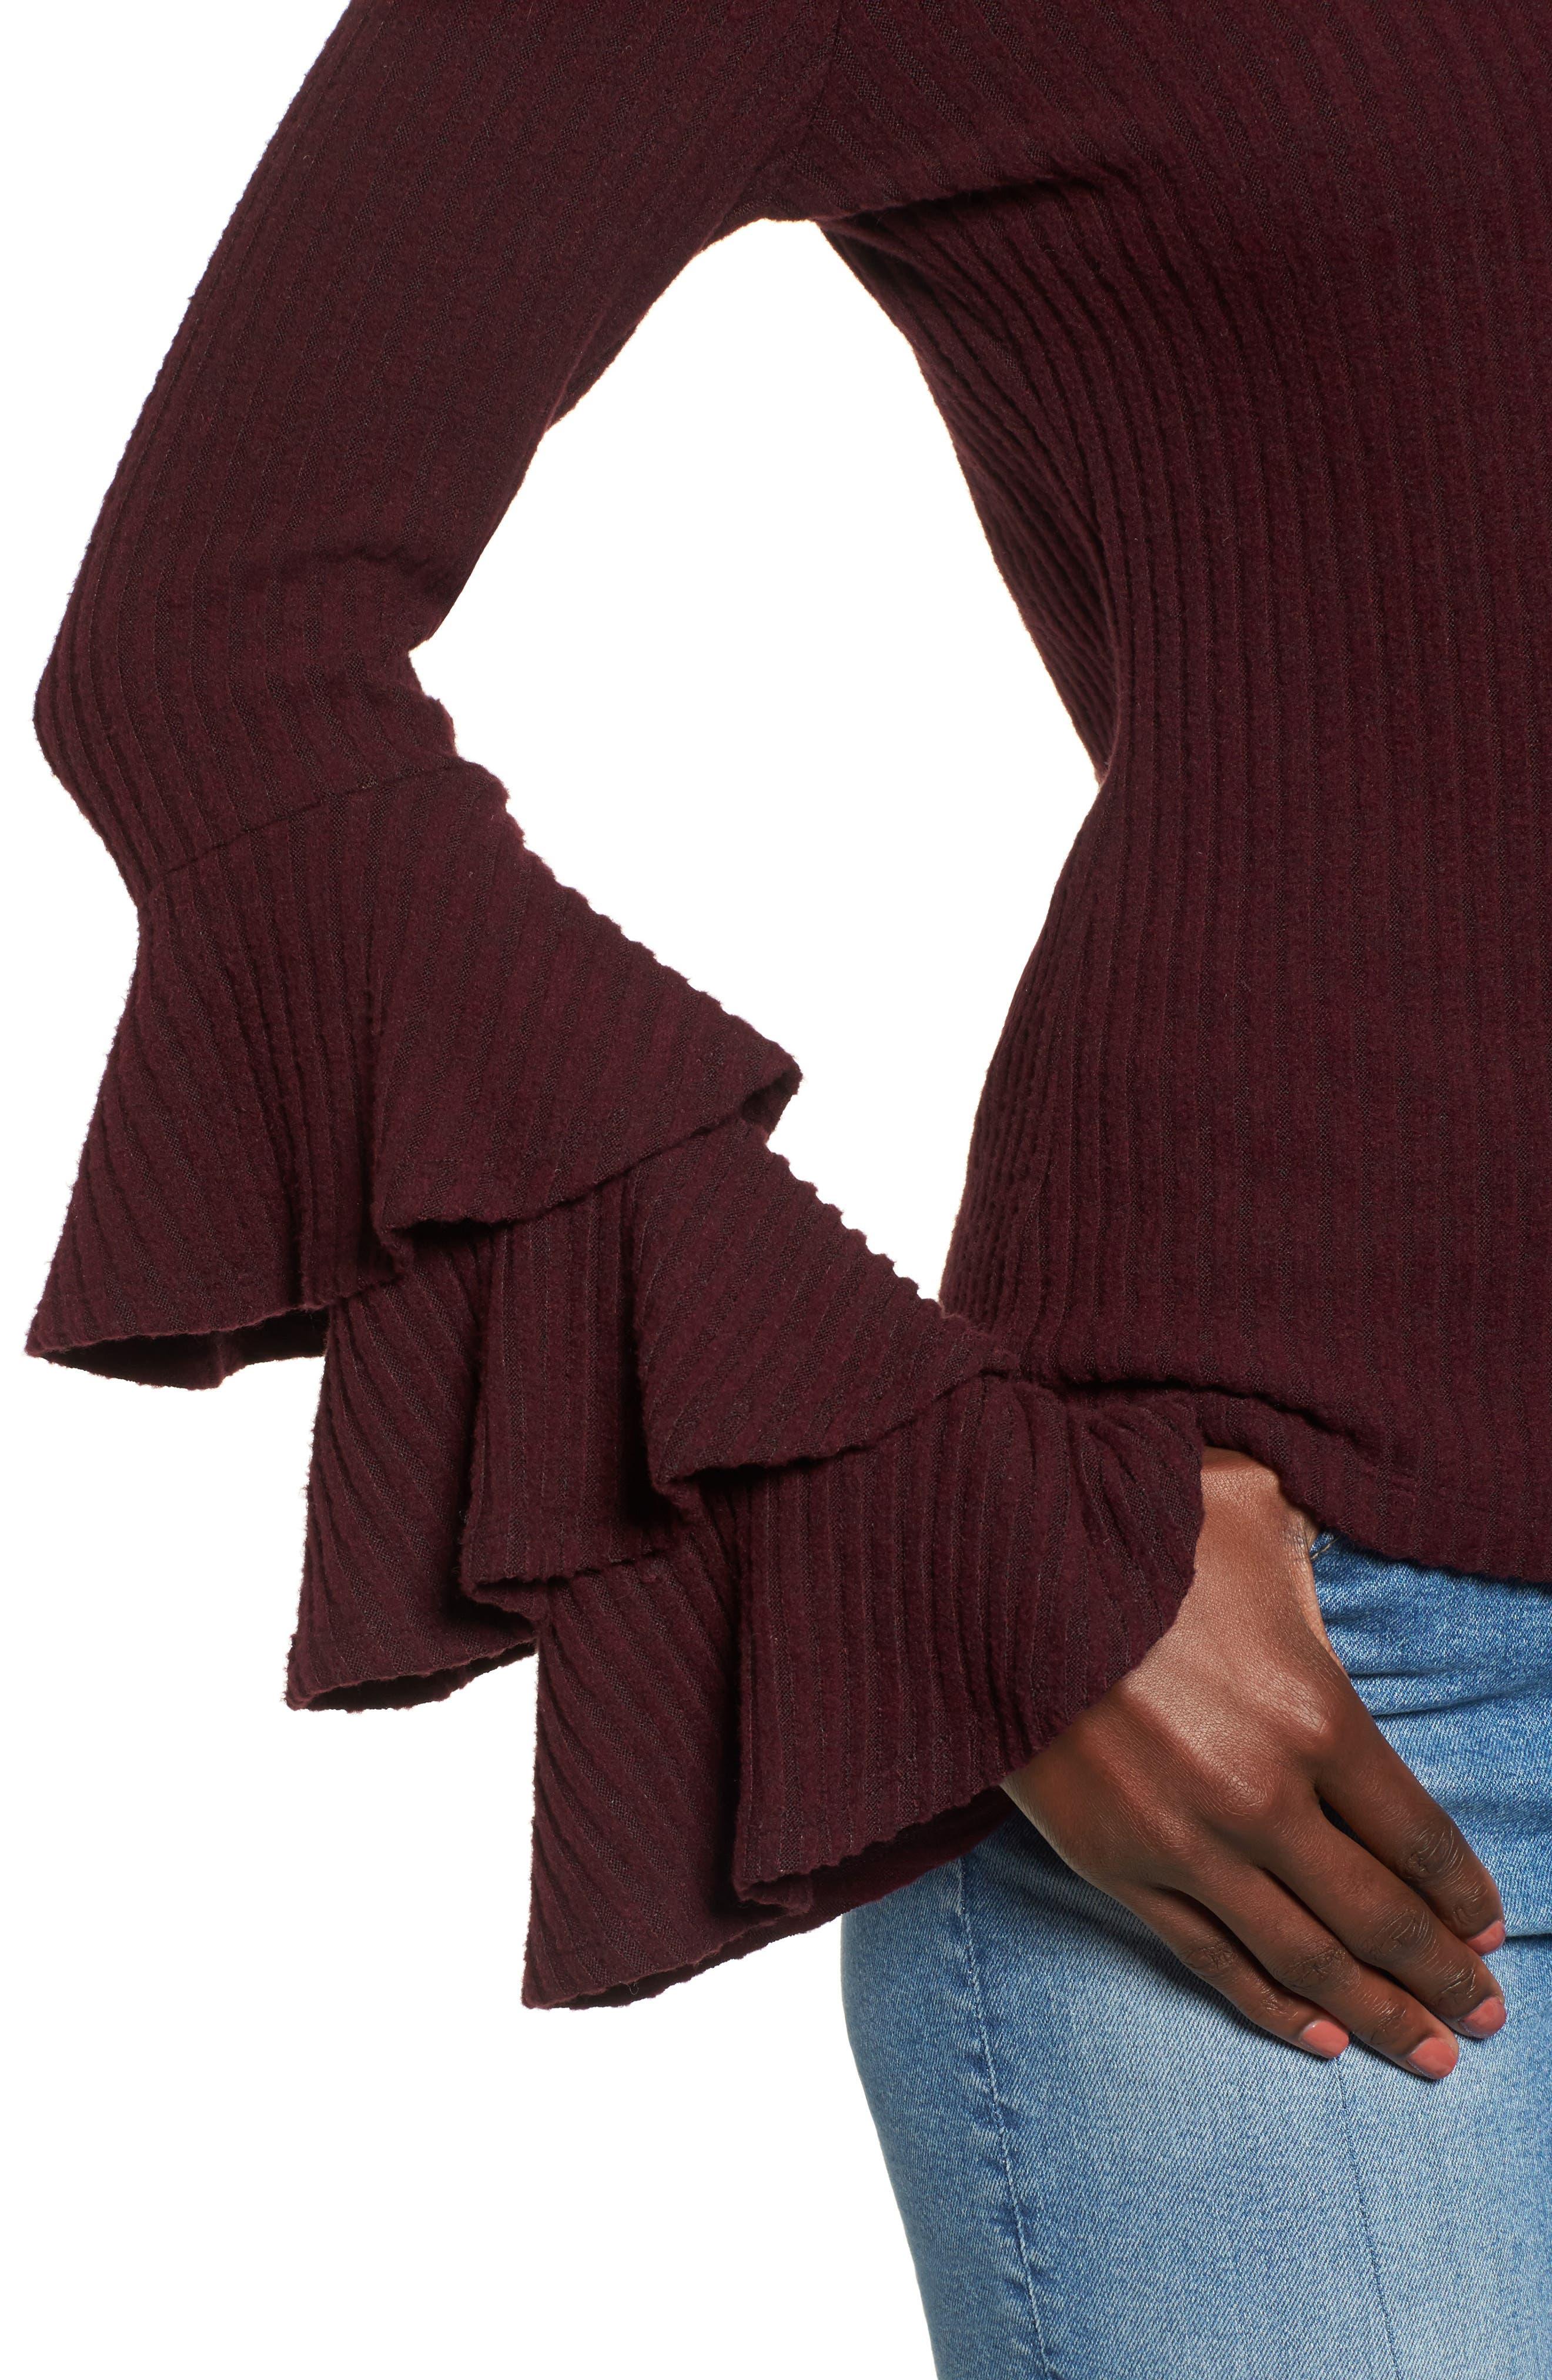 Marie Ruffle Sleeve Top,                             Alternate thumbnail 4, color,                             Burgundy